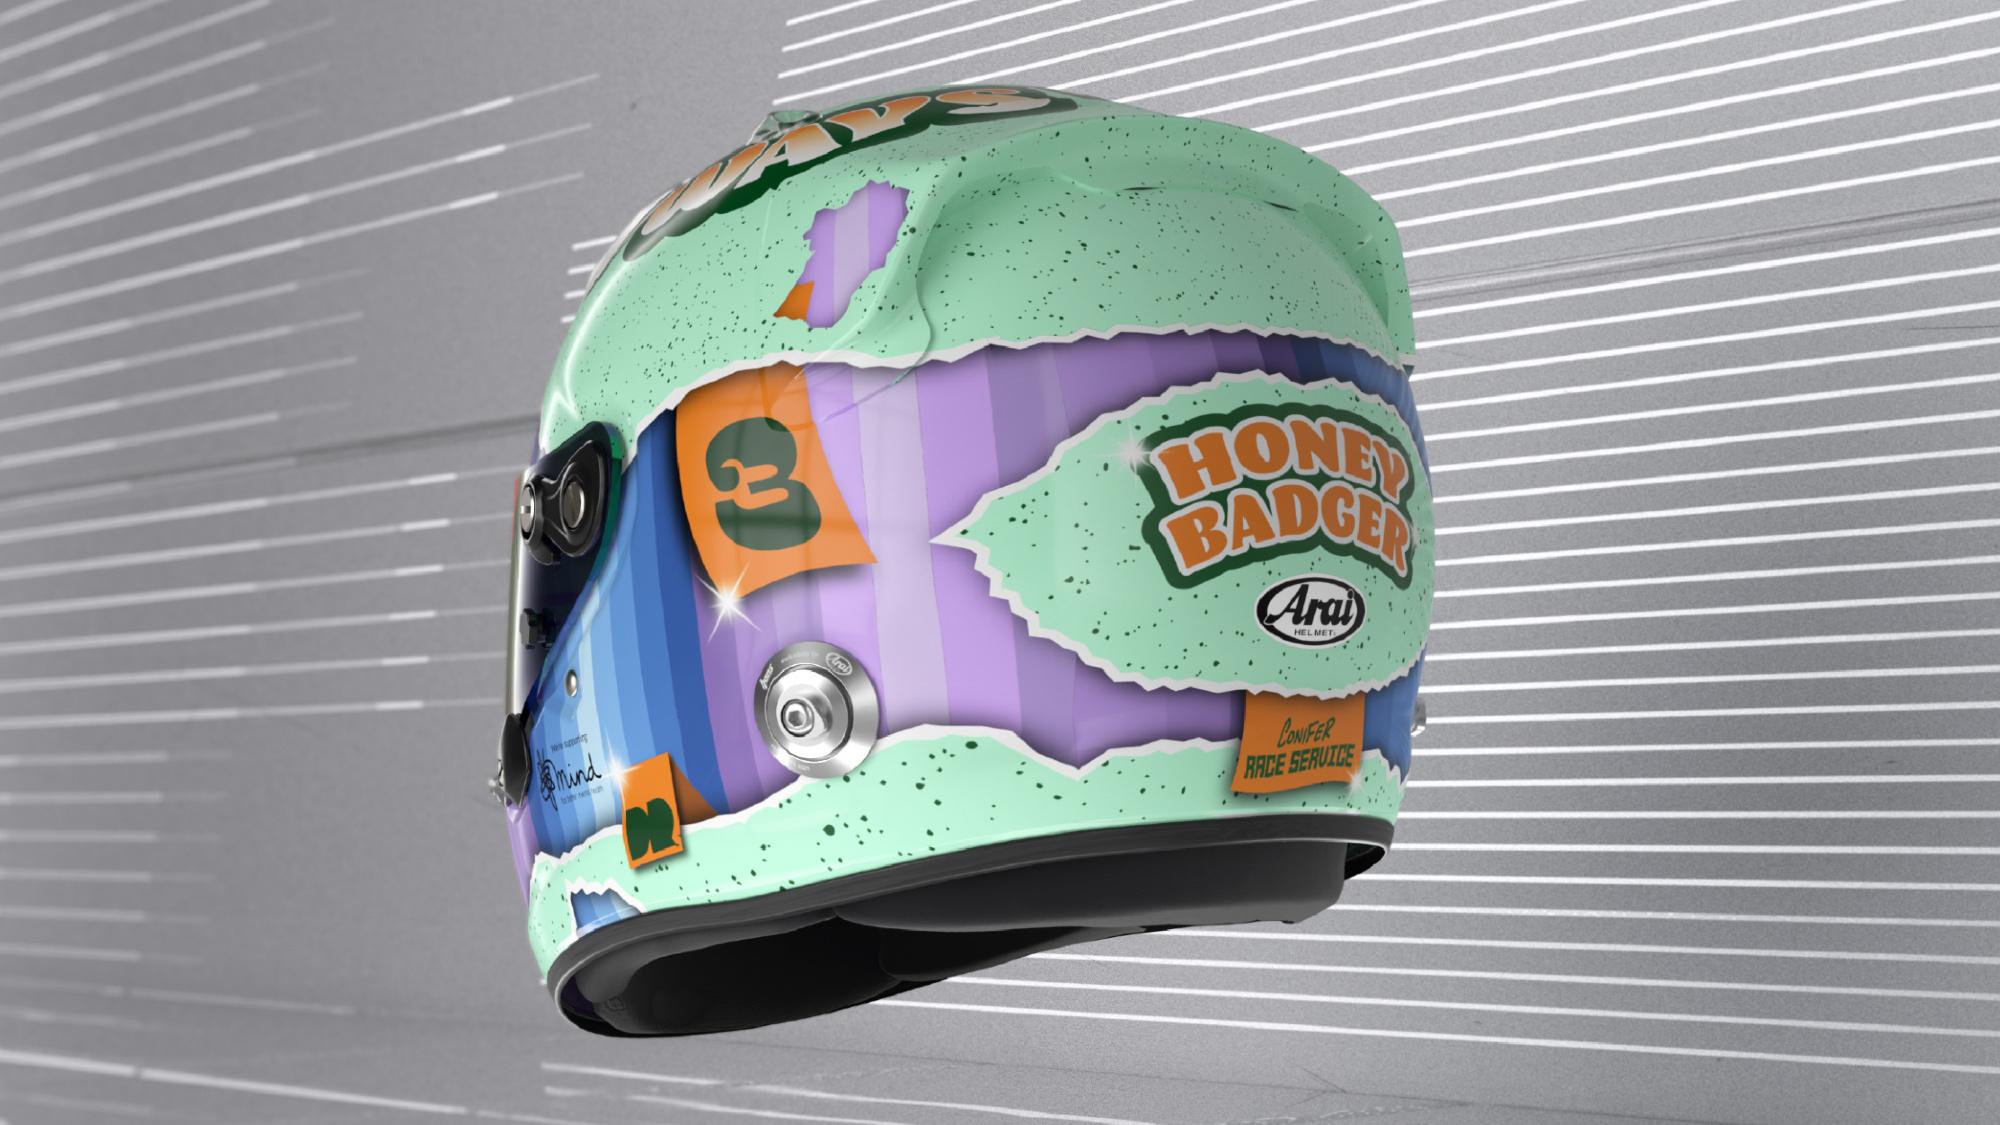 Daniel Ricciardo 2021 F1 helmet